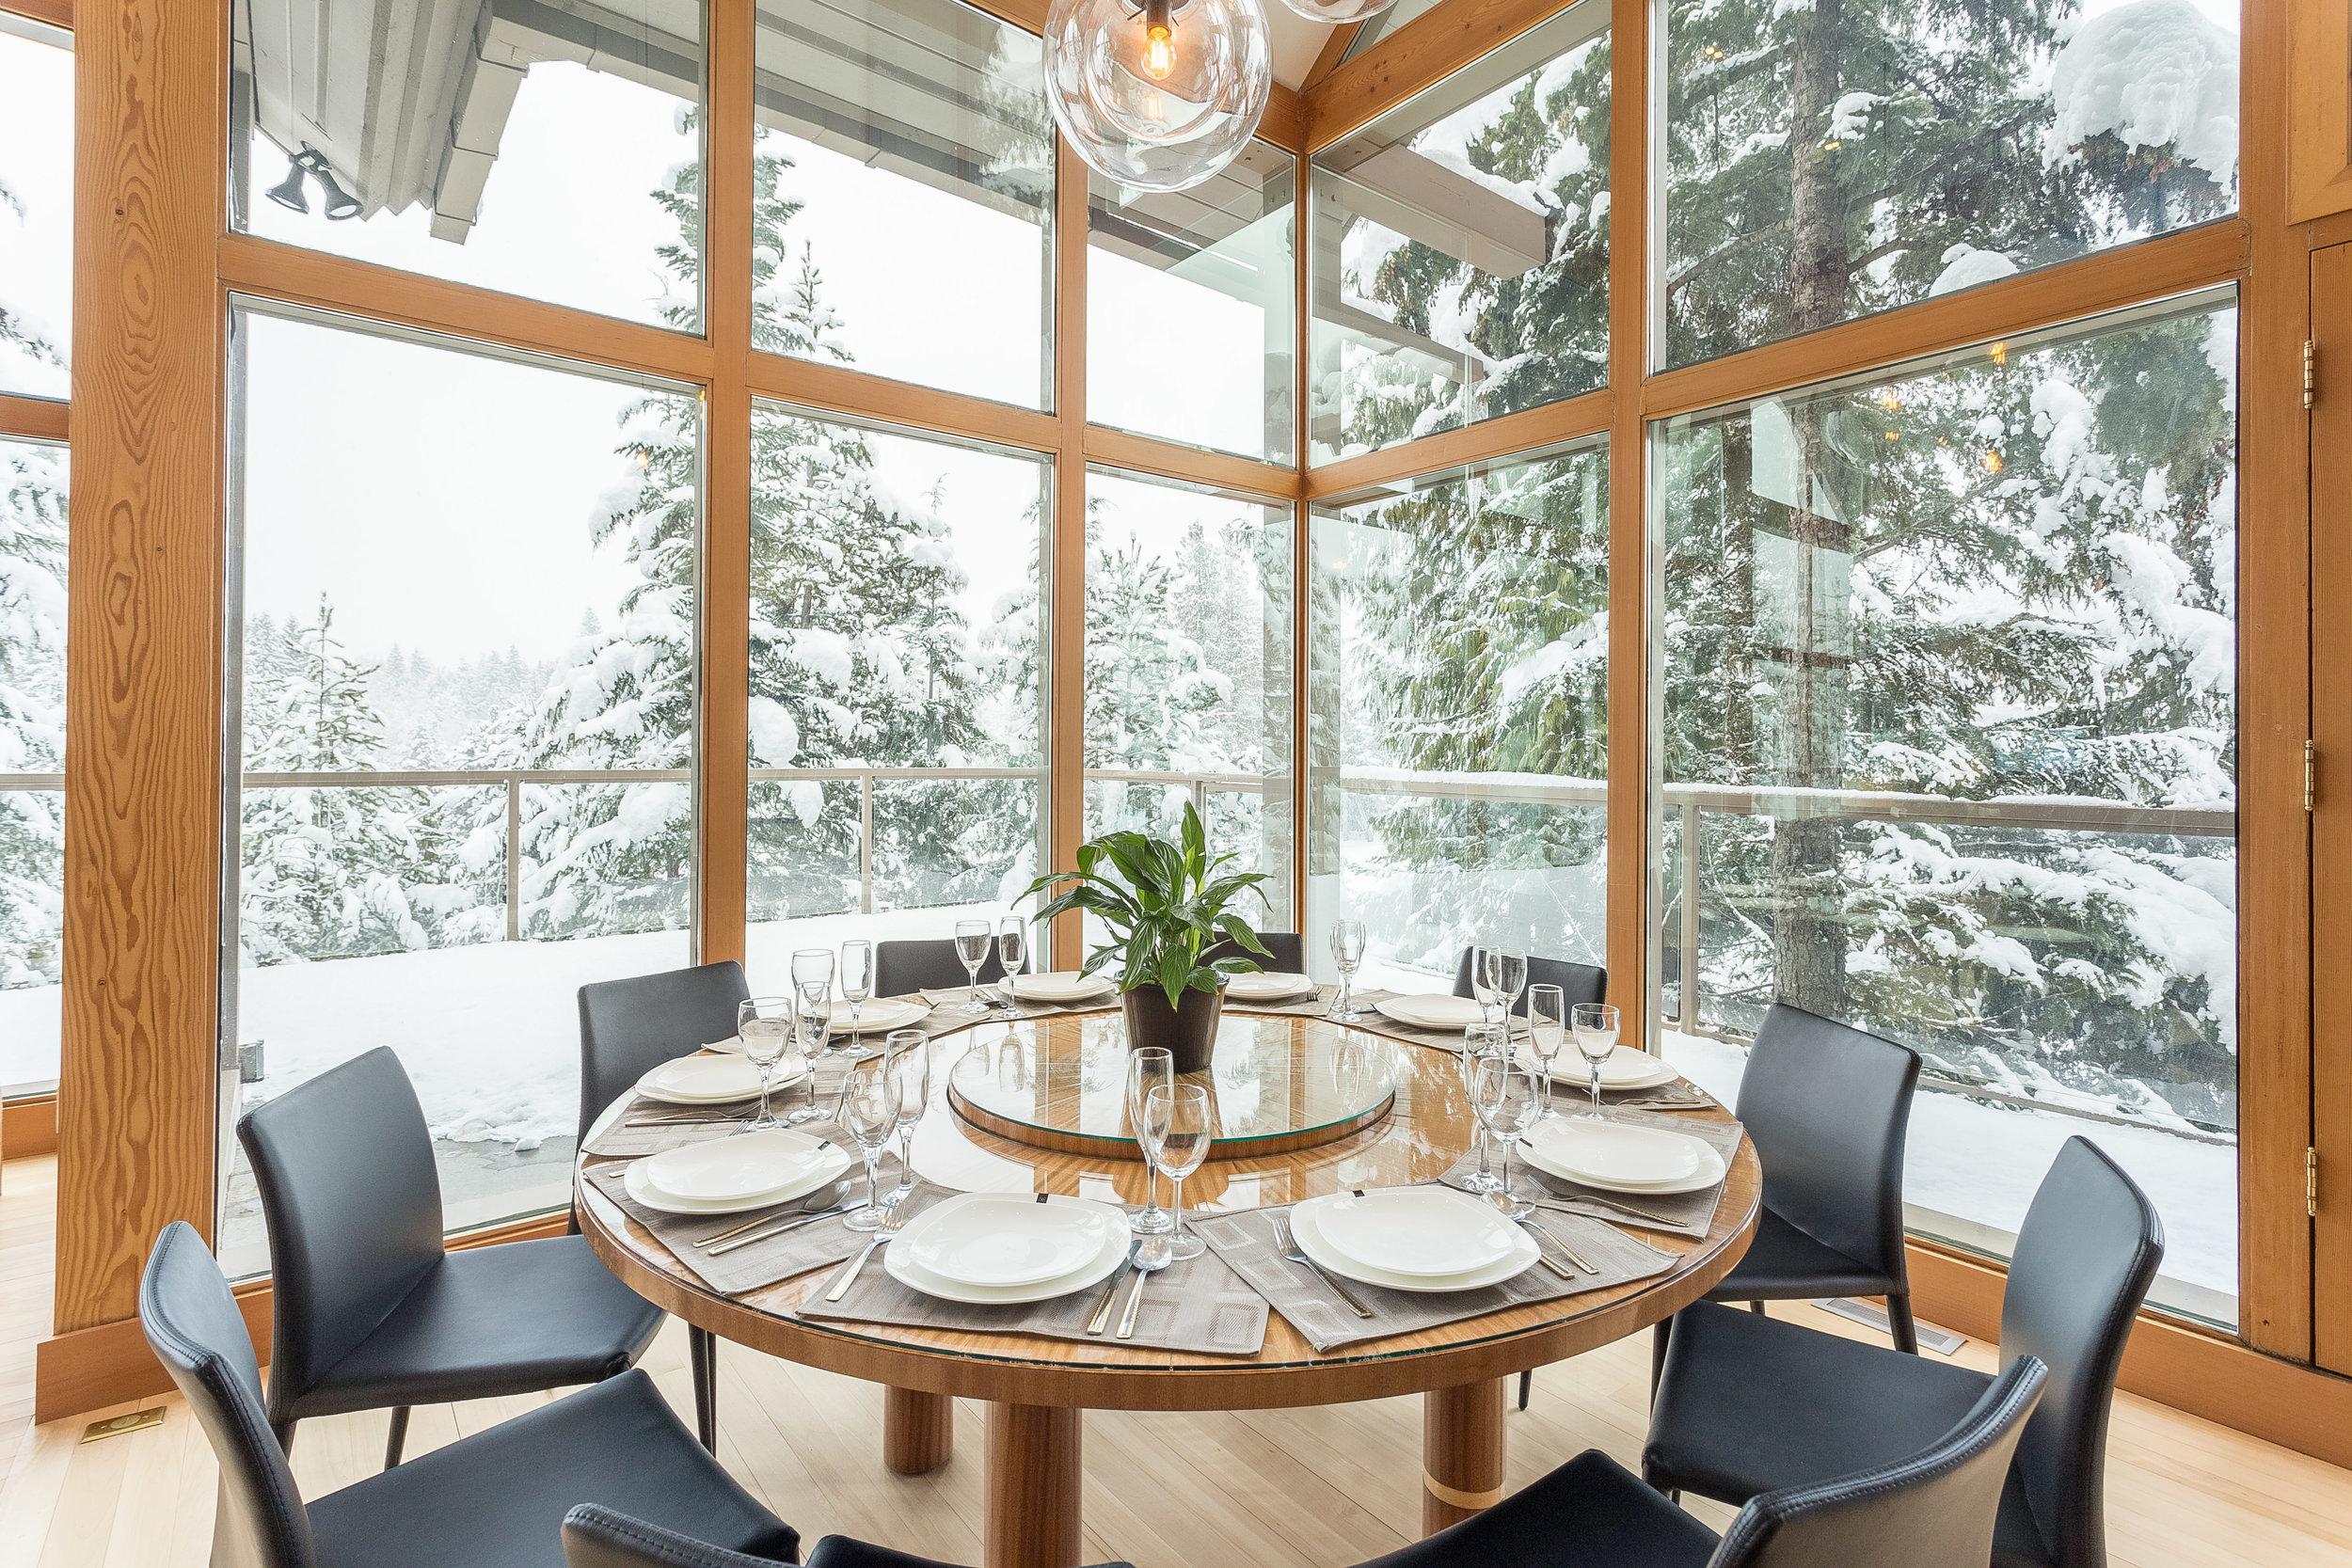 Night Hawk Lane - Indoor dining area with amazing views